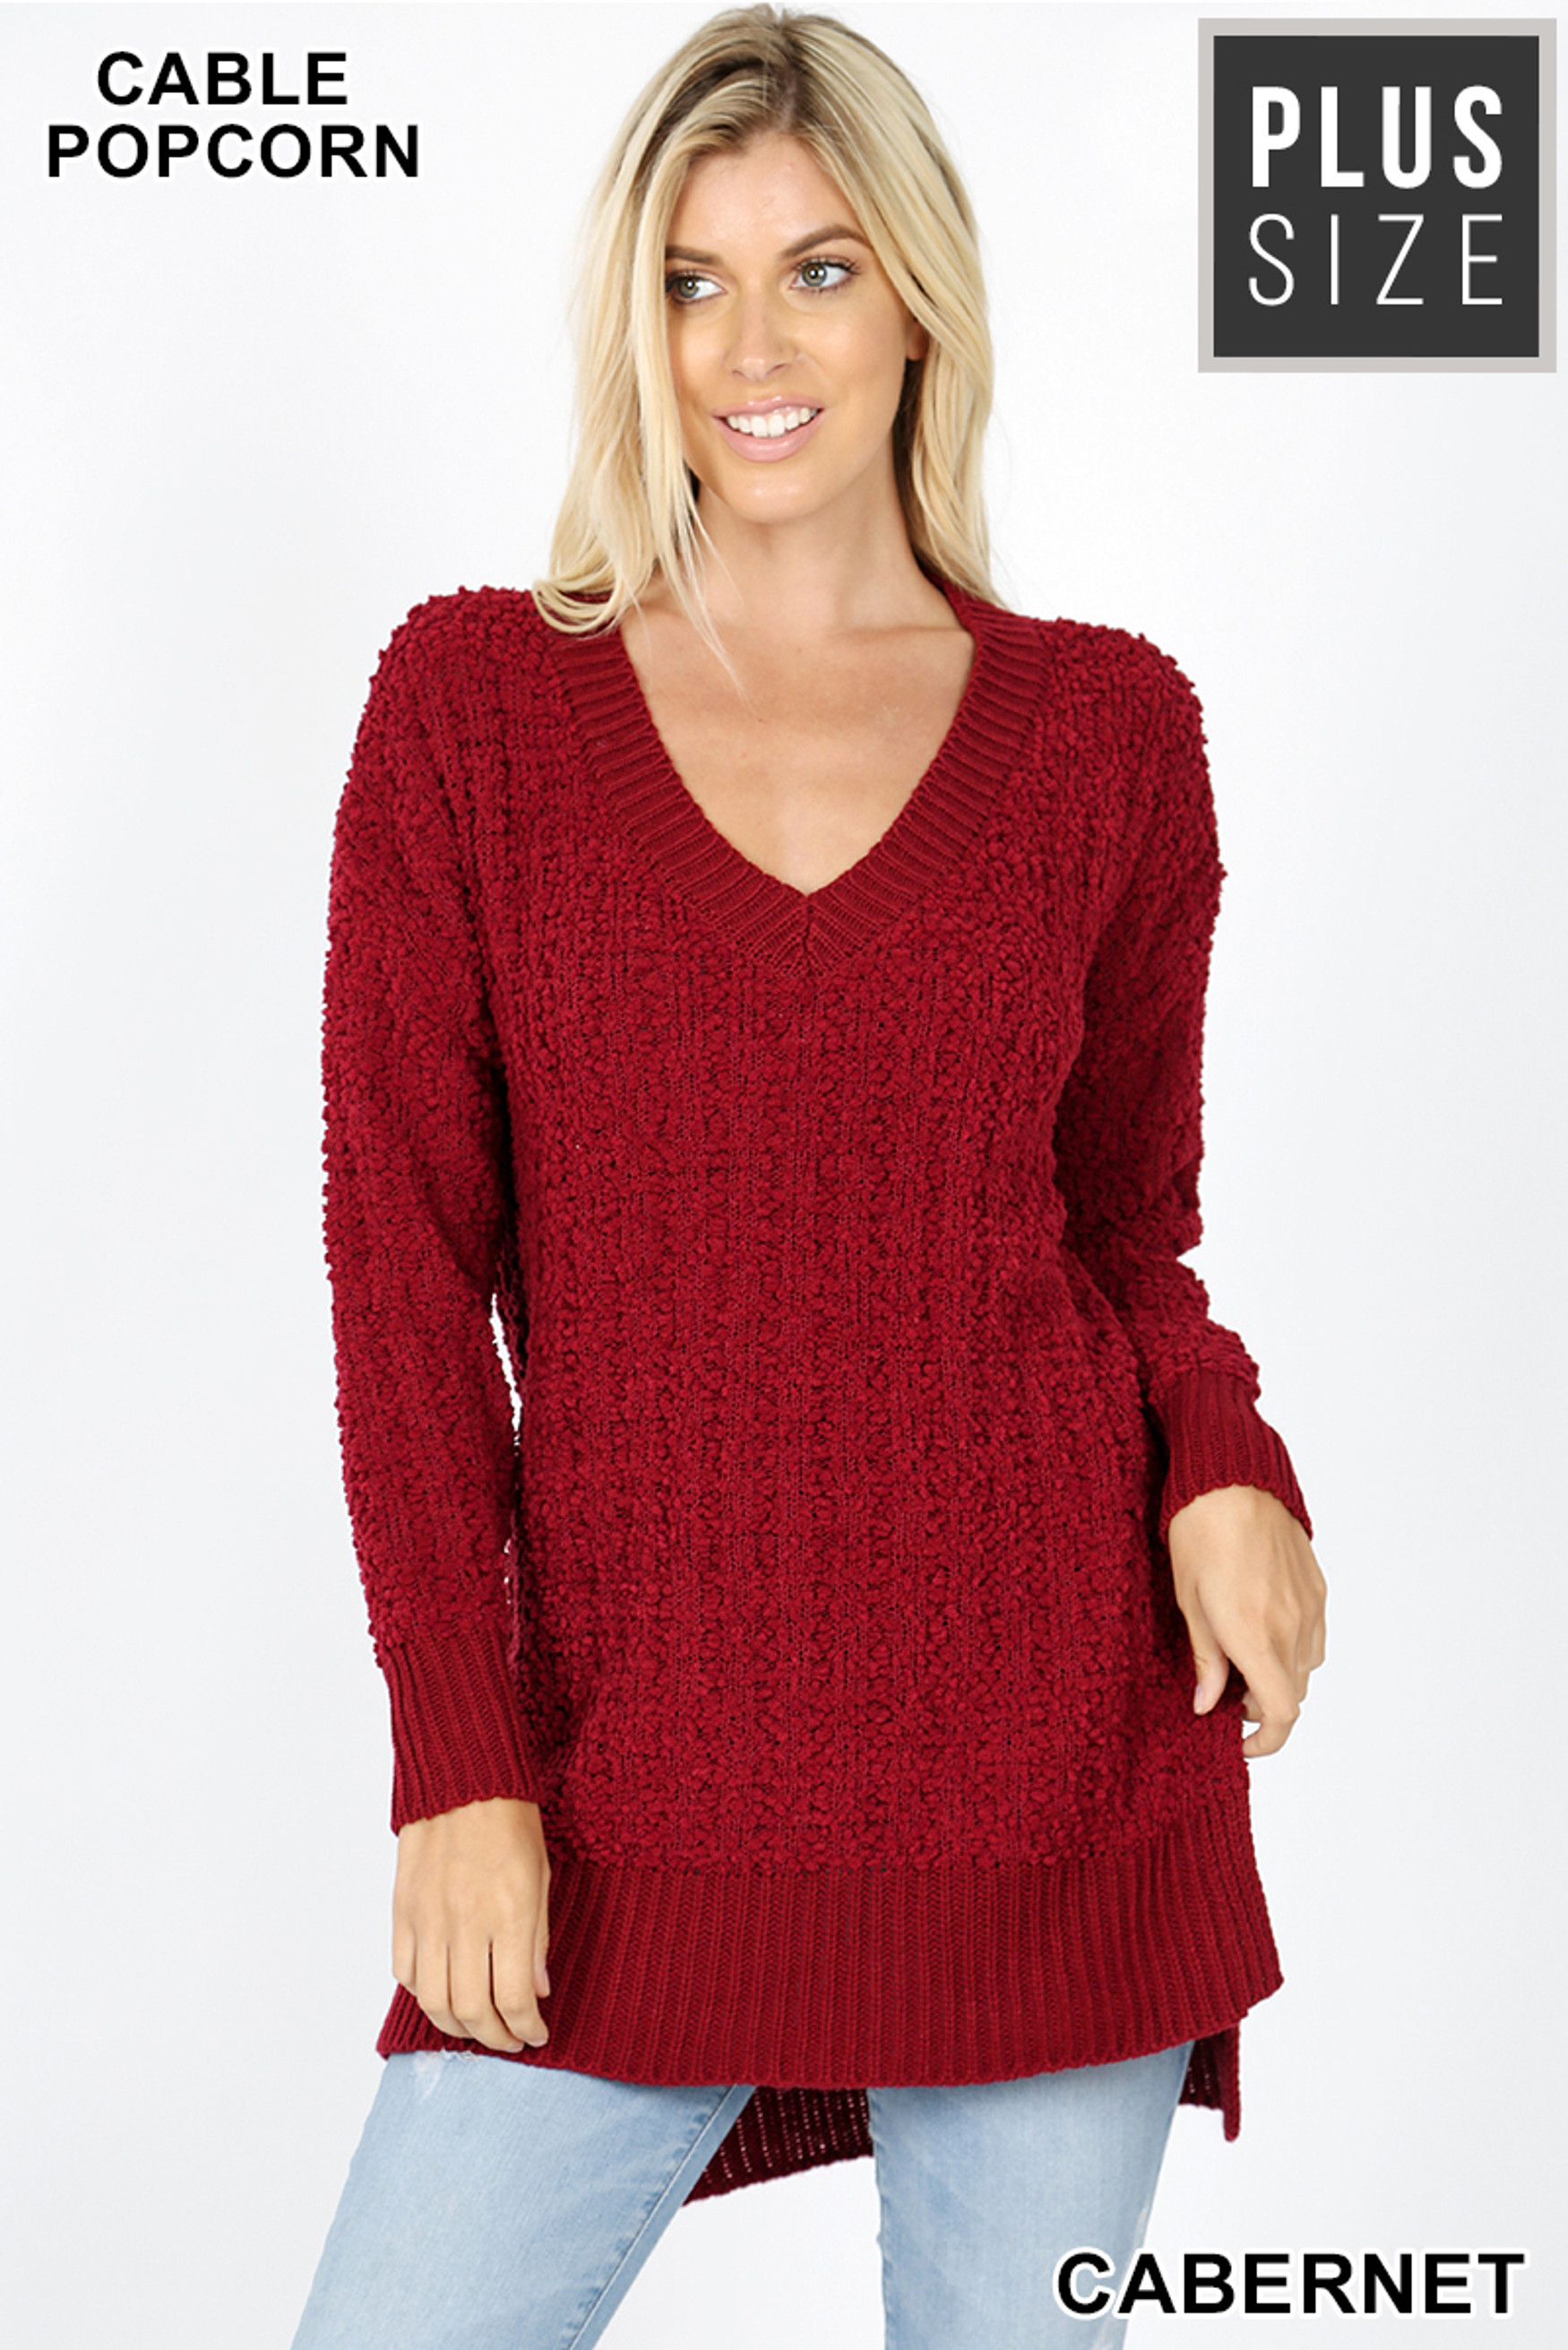 Front image of Cabernet Cable Knit Popcorn V-Neck Hi-Low Plus Size Sweater